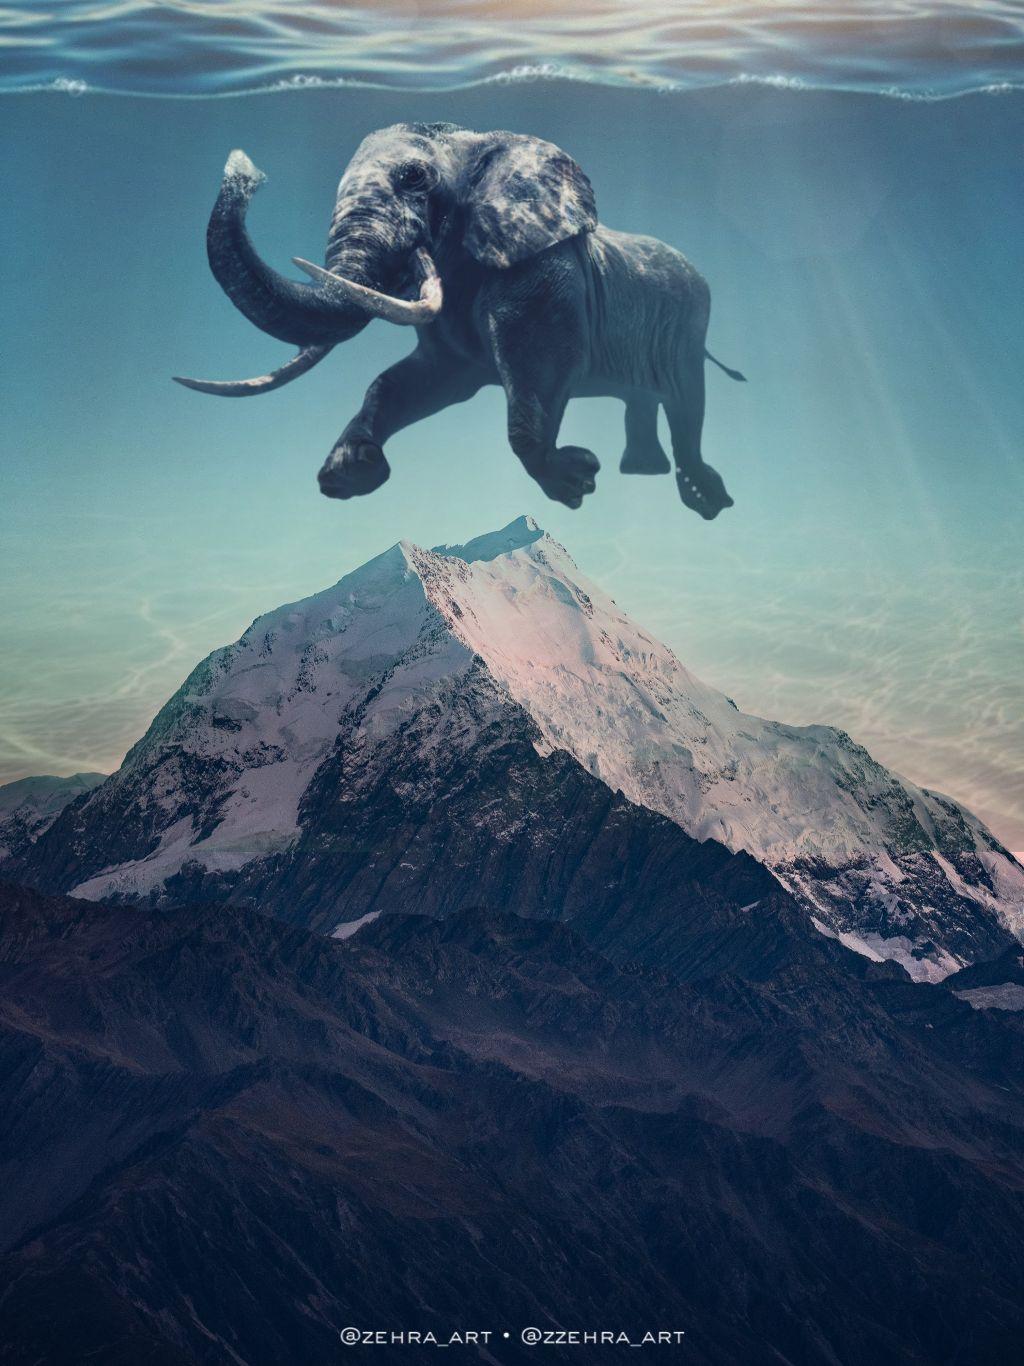 #elephant #mountain  #surreal #nature #art #freetoedit